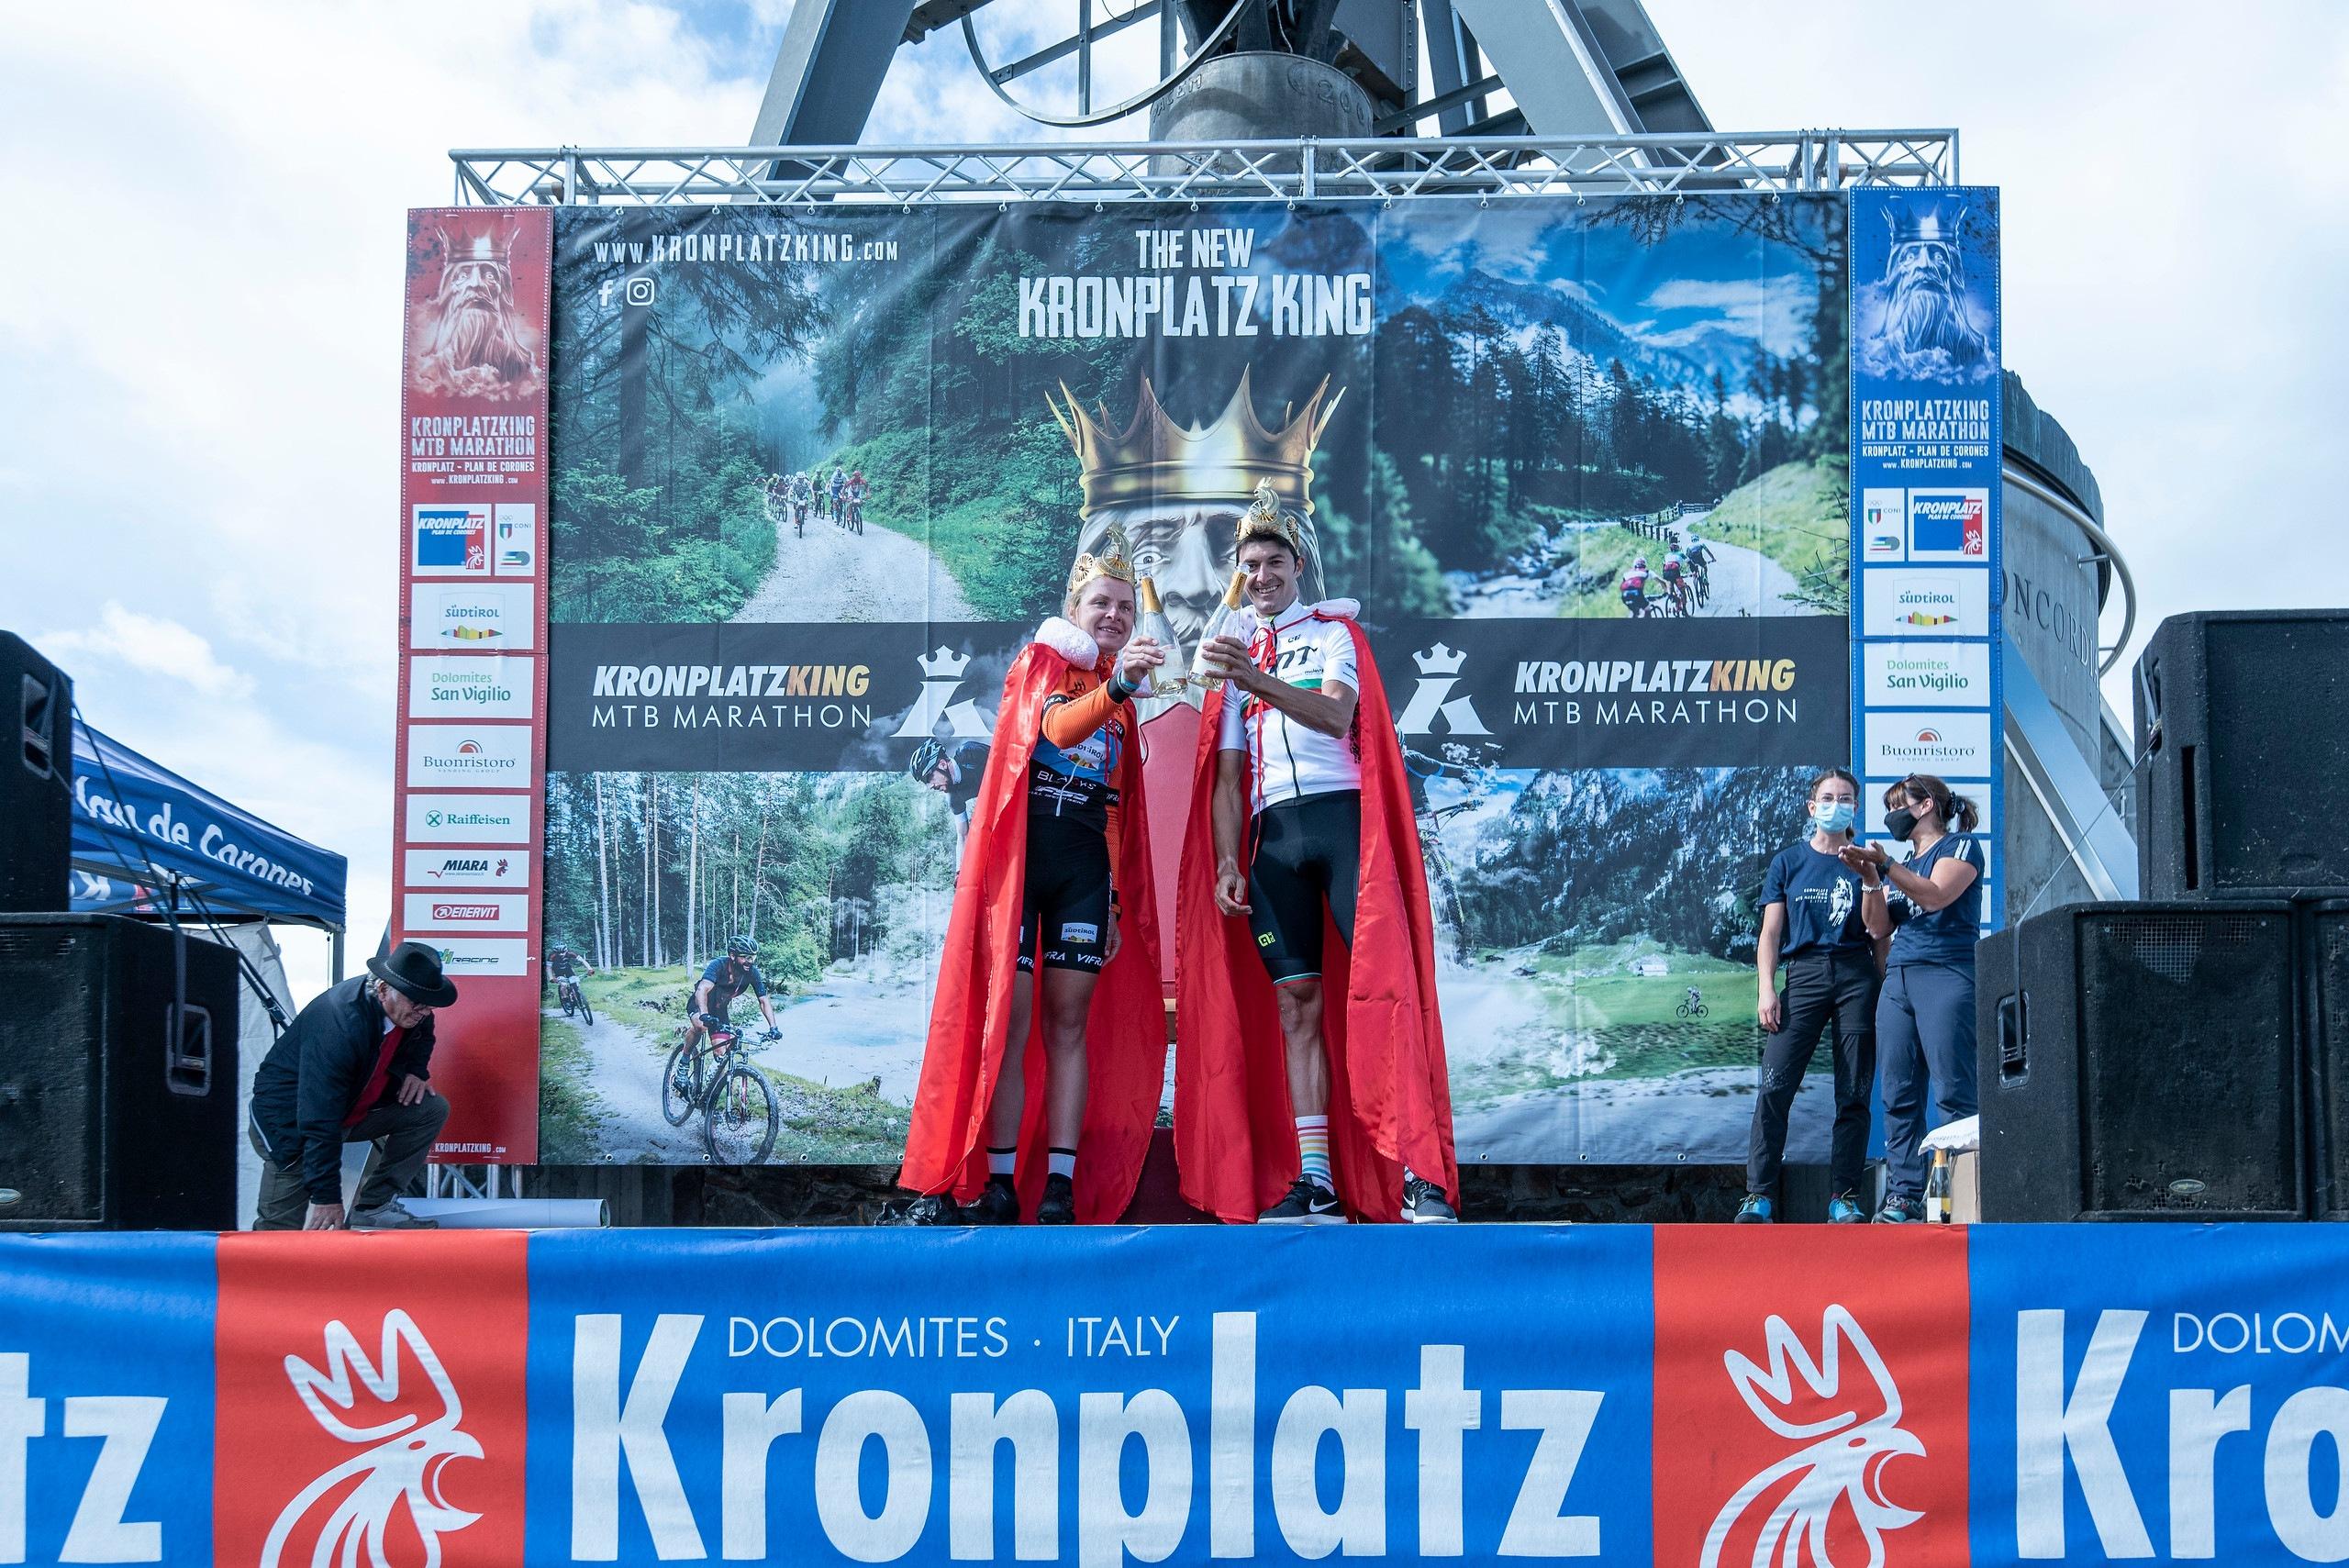 Katazina Sosna und Tiago Ferreira gewinnen Kronplatz King 2021